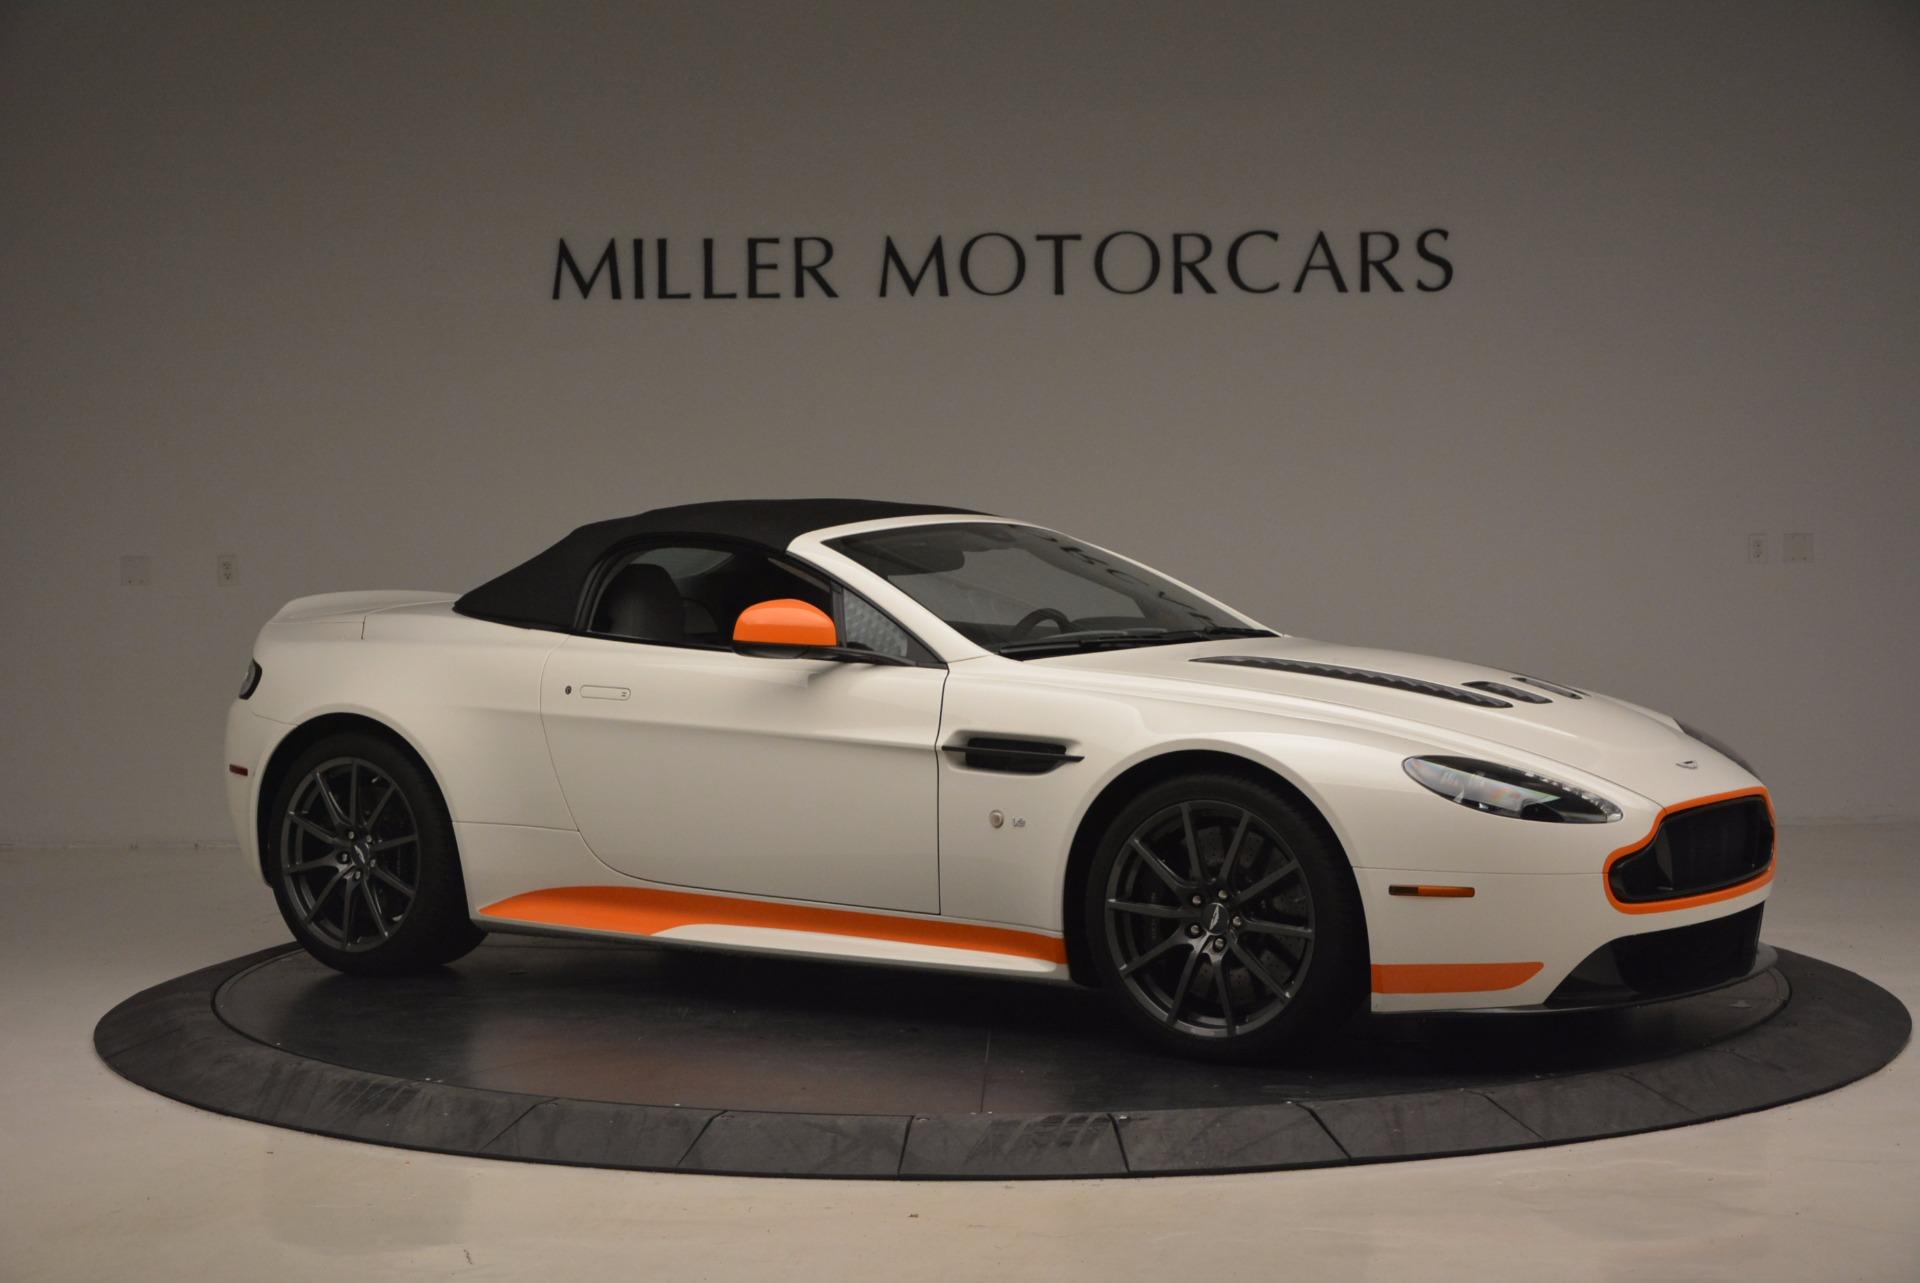 Used 2017 Aston Martin V12 Vantage S Convertible For Sale In Greenwich, CT. Alfa Romeo of Greenwich, 7514 1134_p22